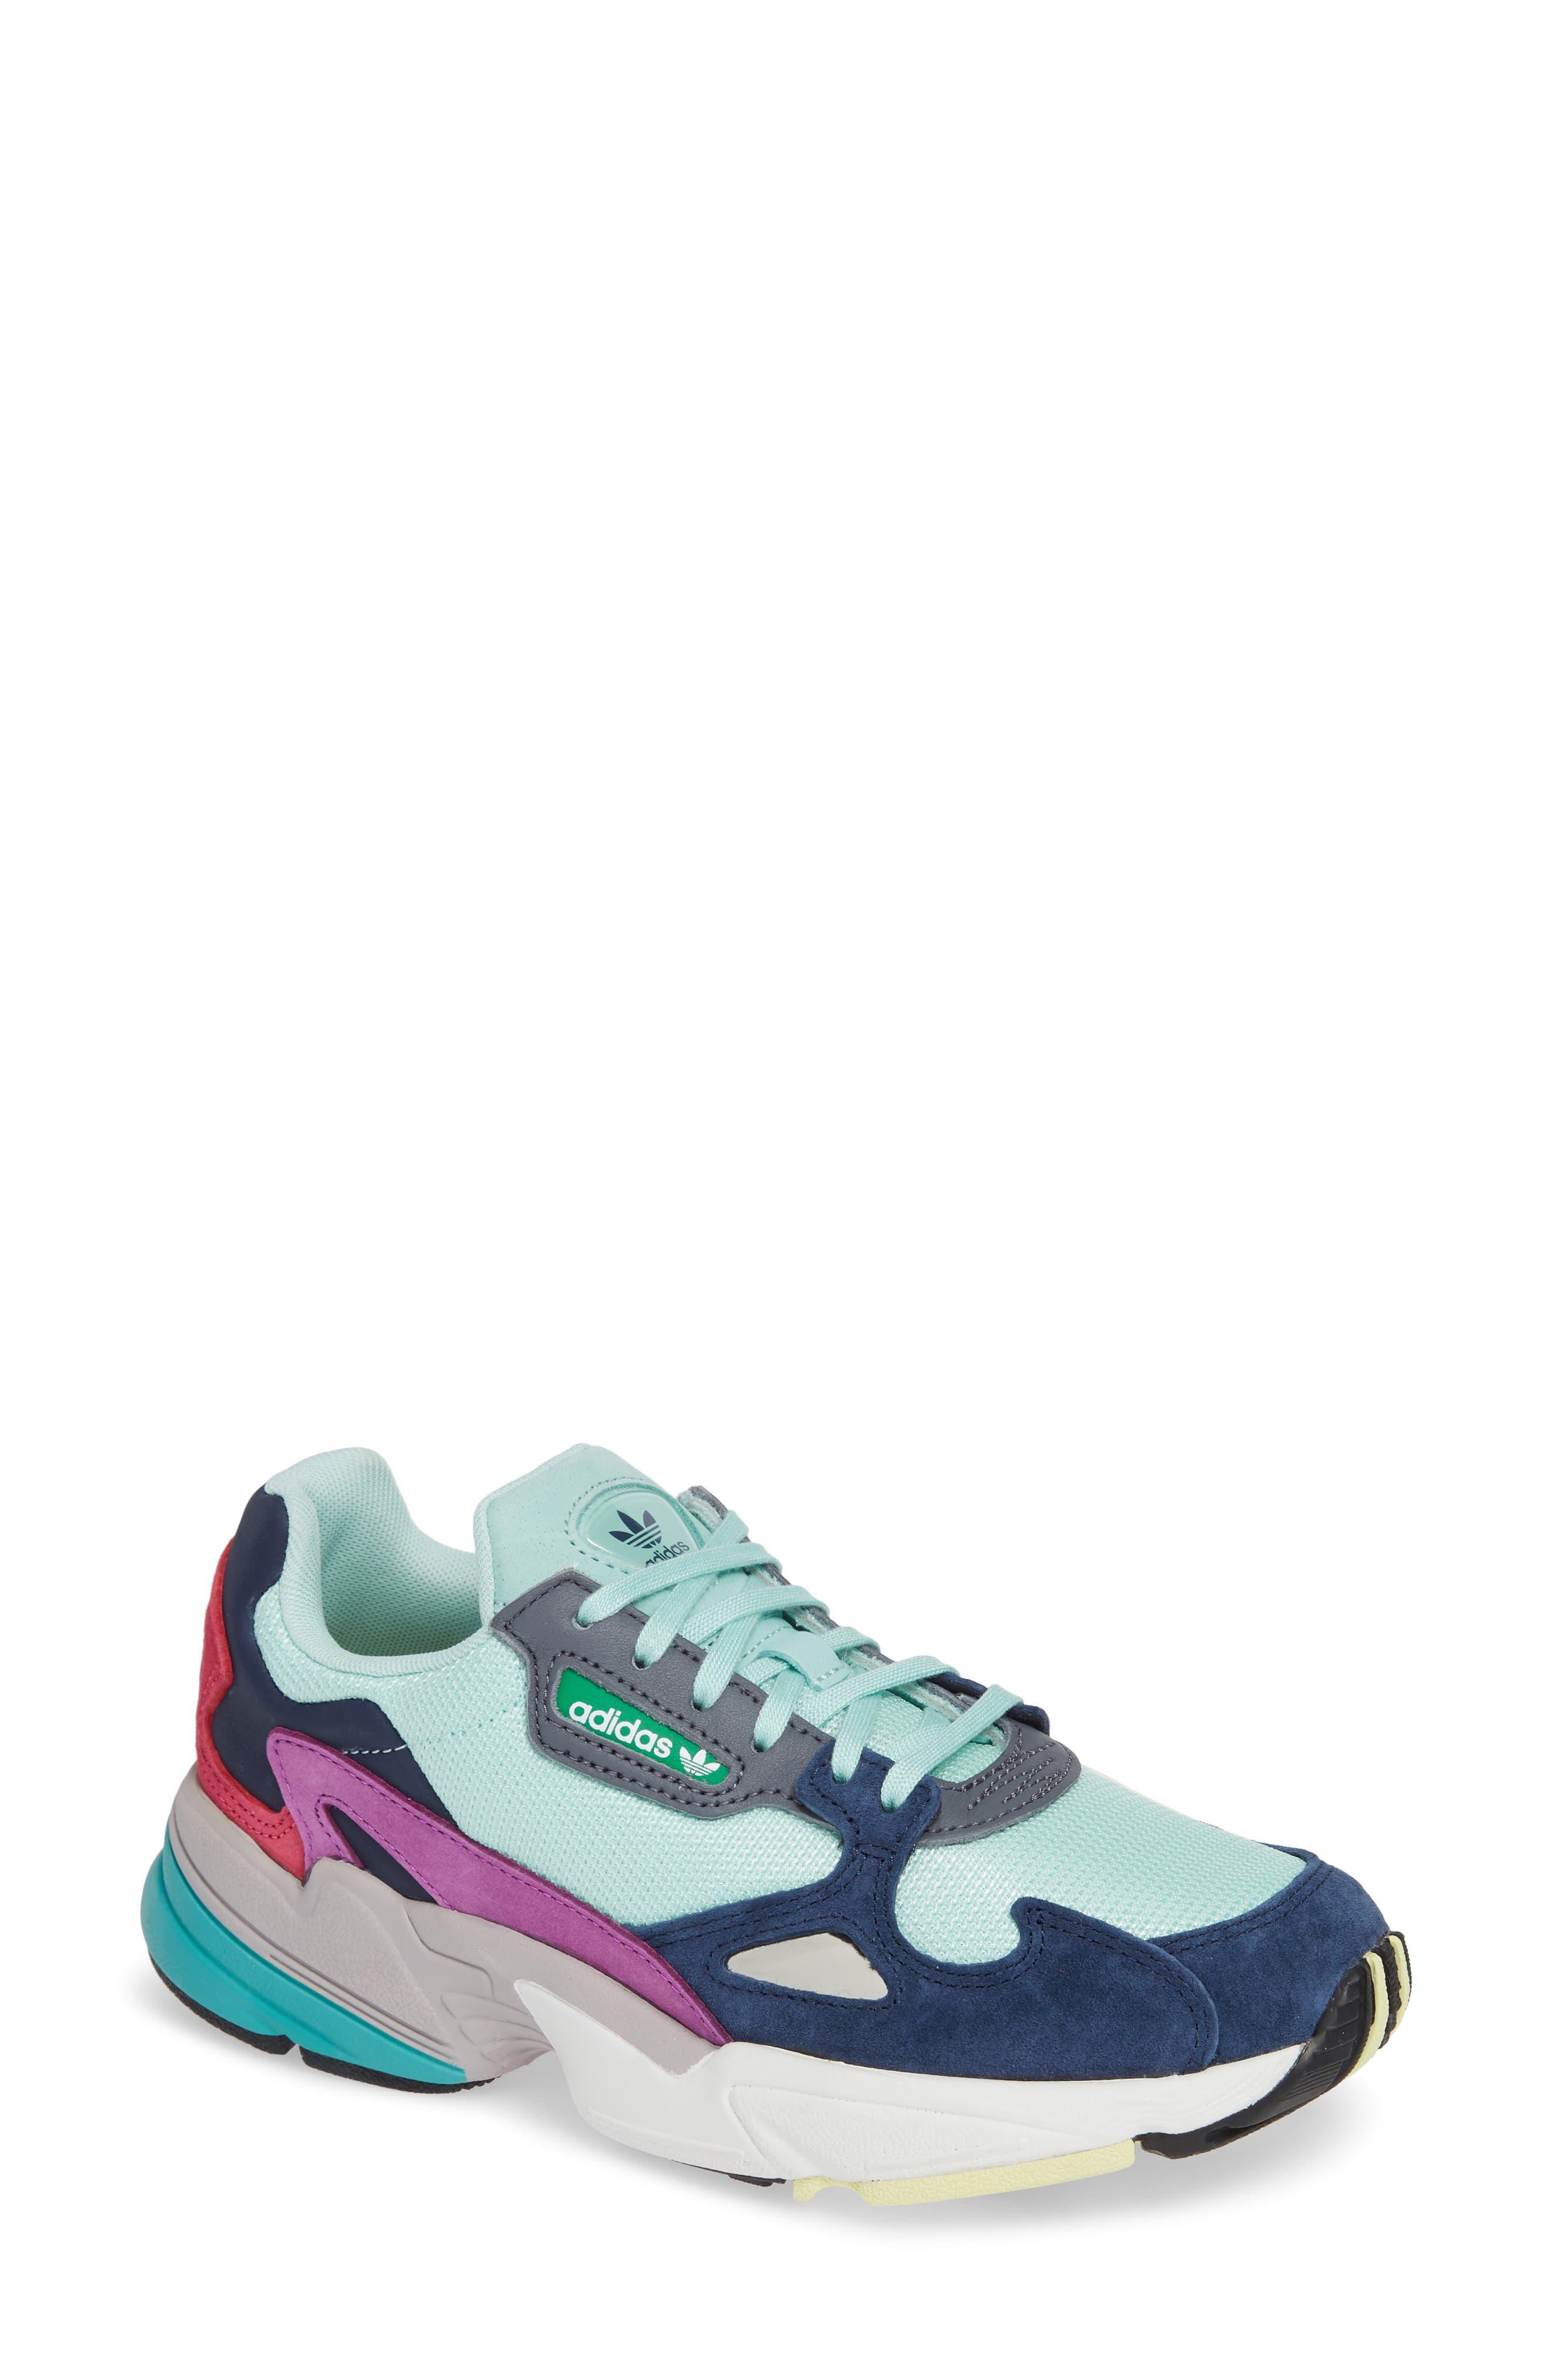 closeout adidas nmd runner w salmon raw rosa 3c403 0f77d